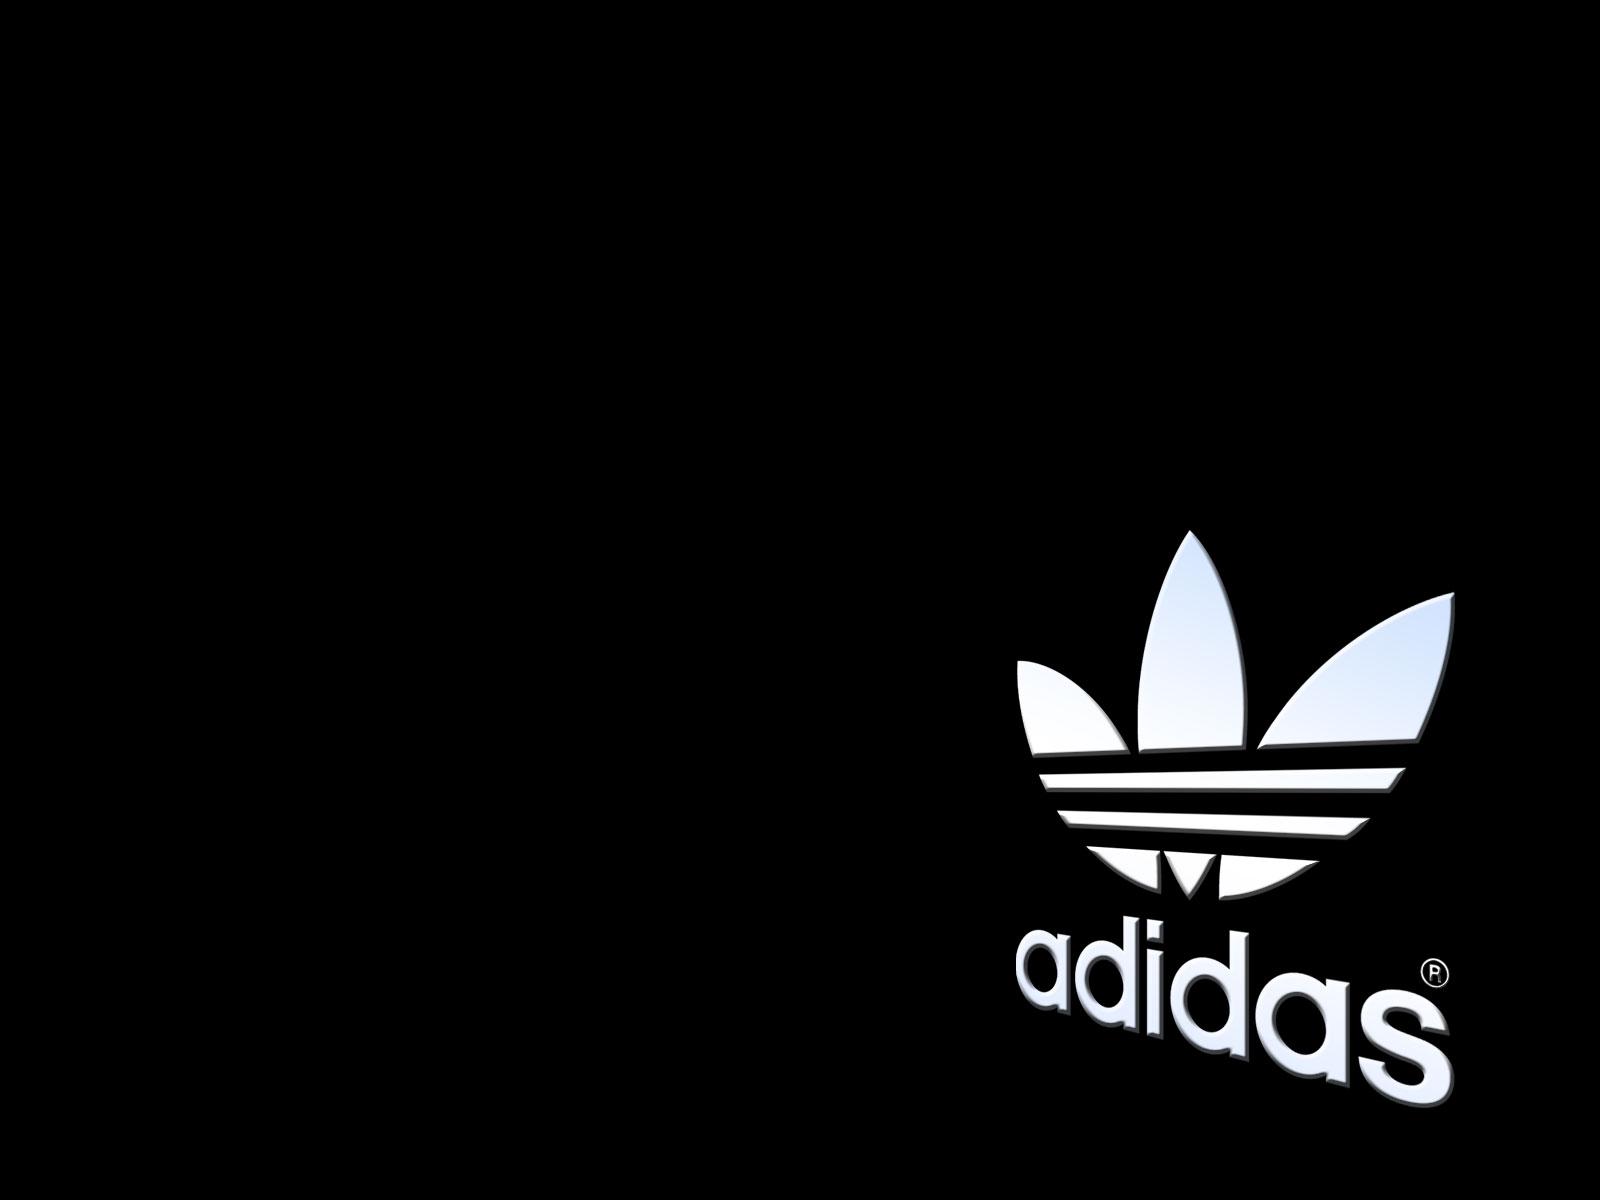 adidas - photo #46